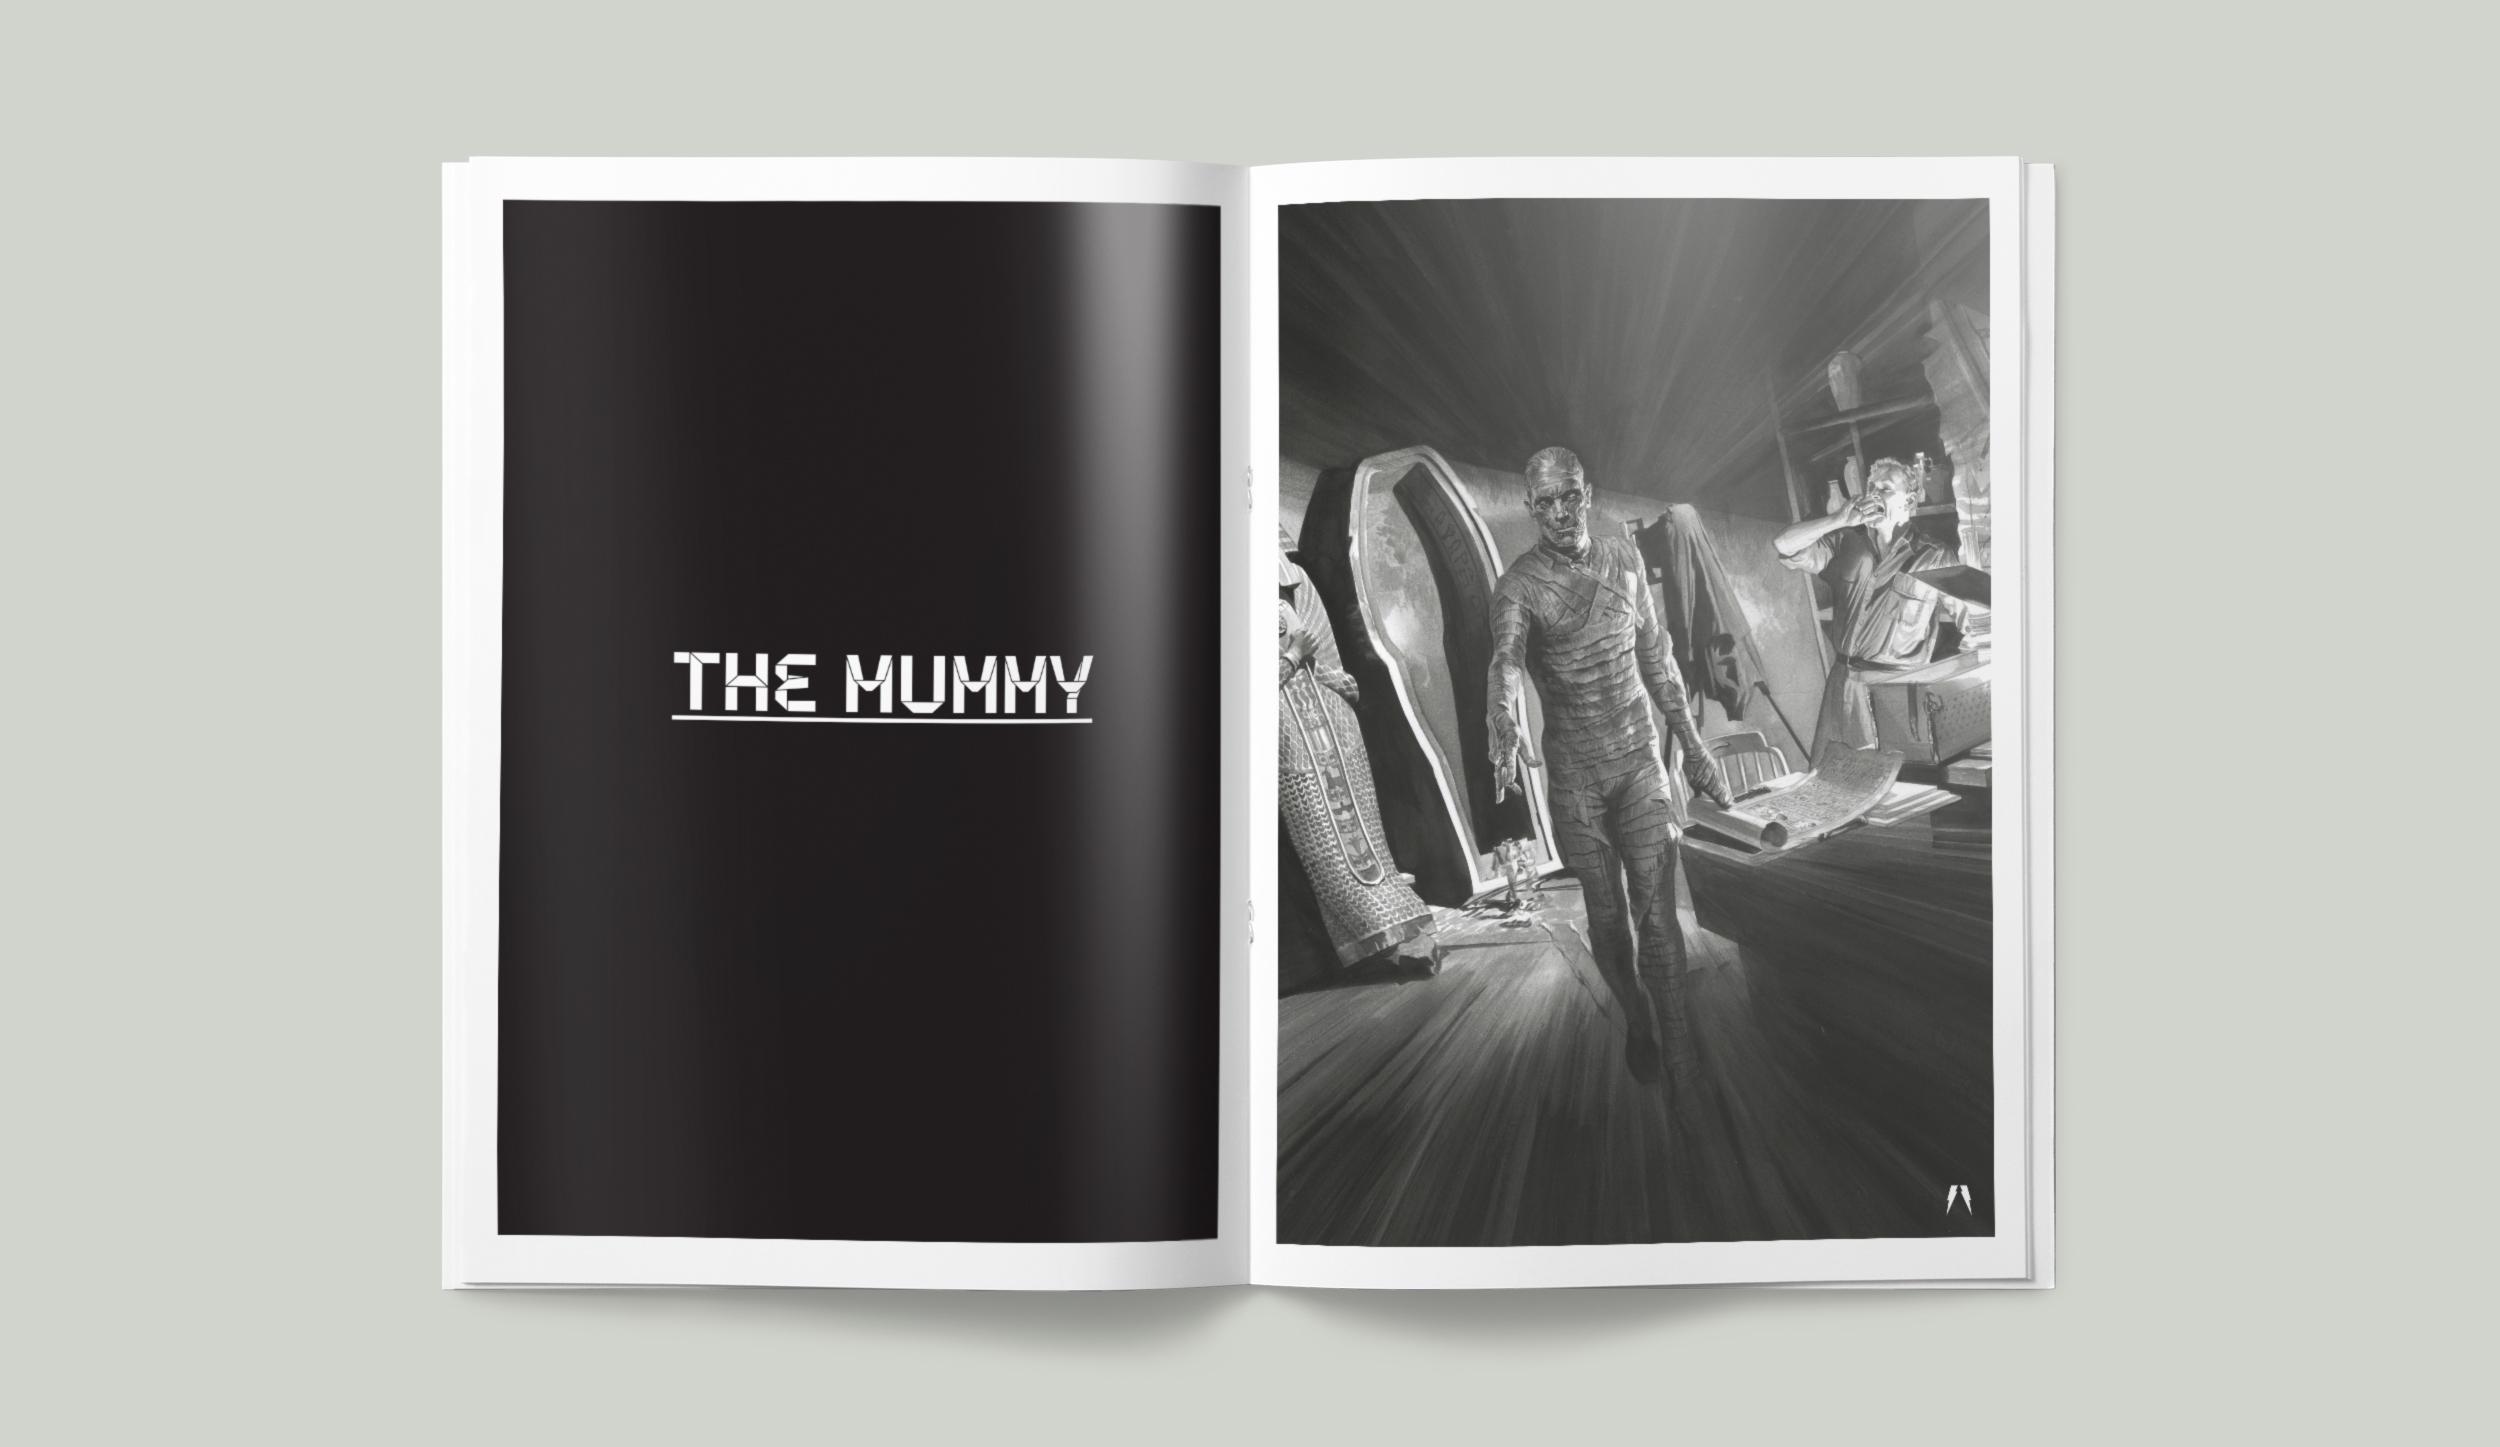 Universal Monsters. The Mummy